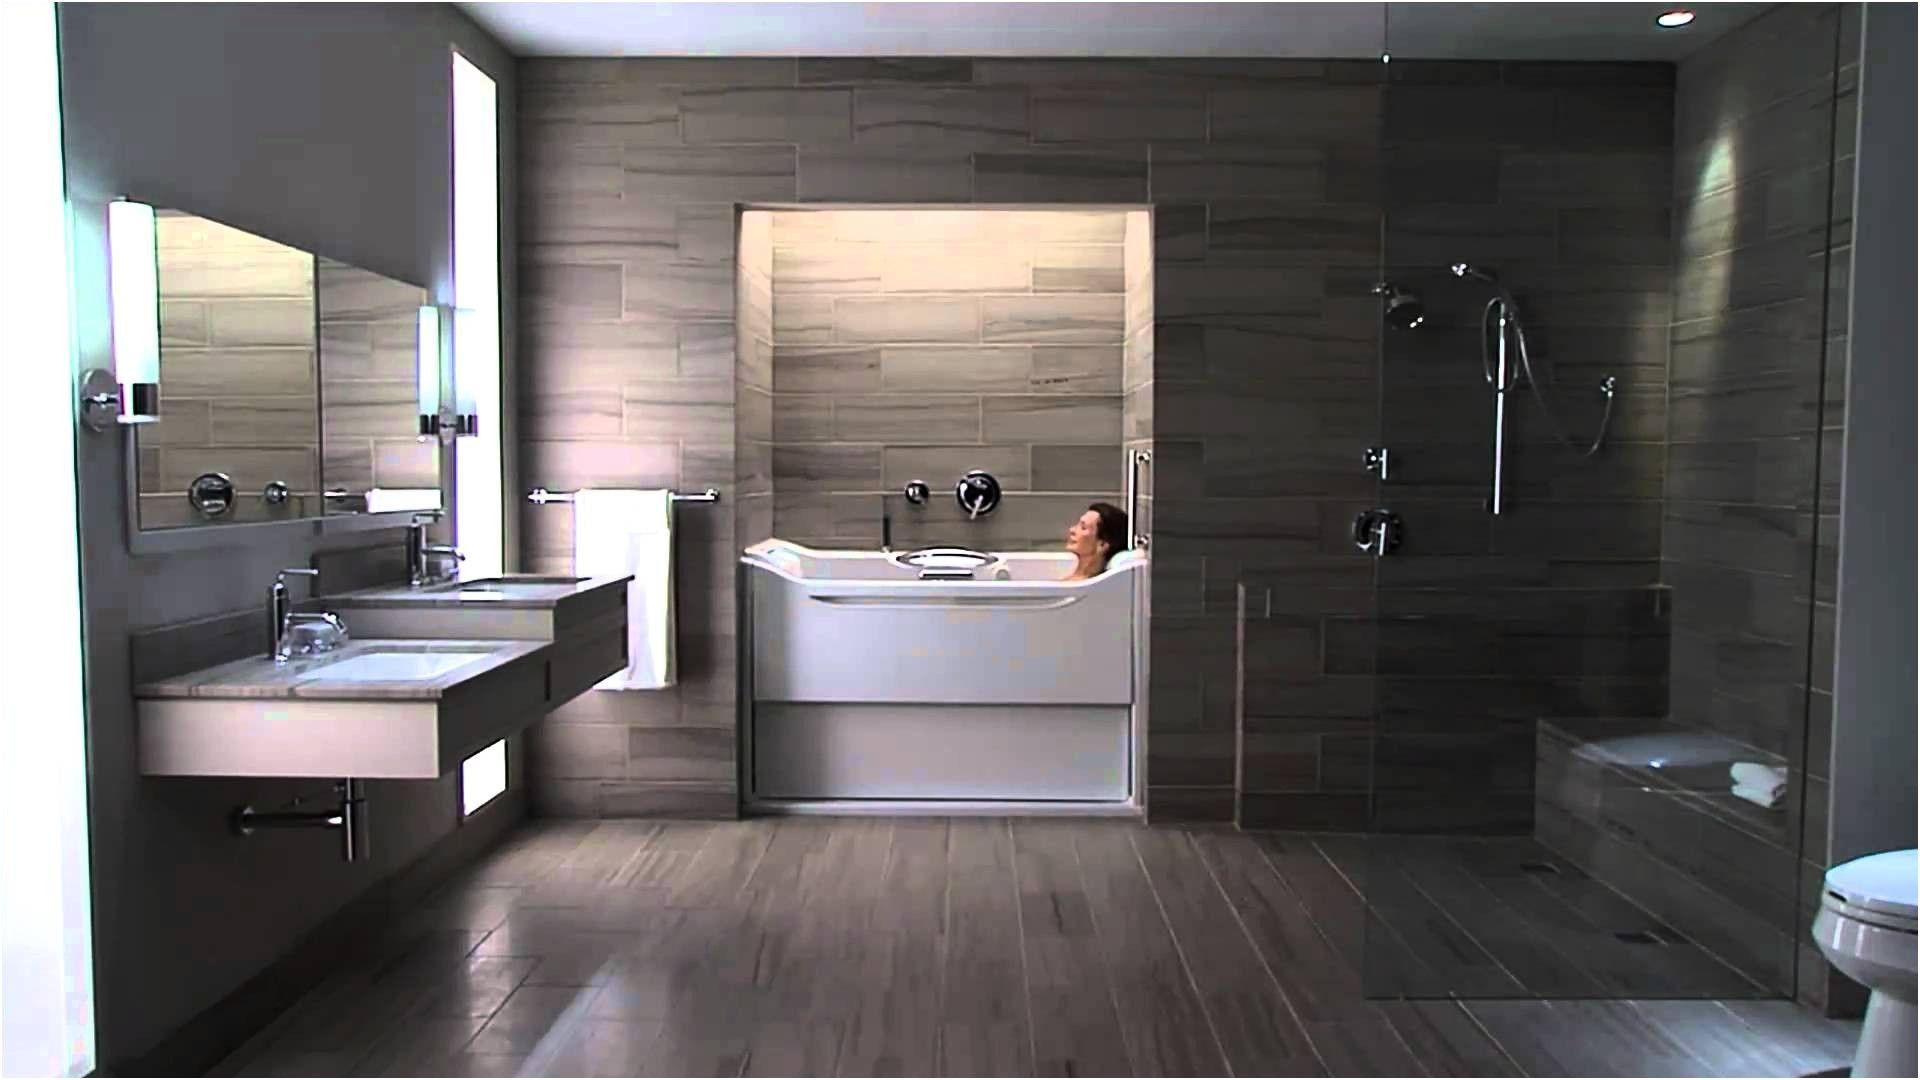 Kohler Design Bathroom Ideas Idolza From Kohler Bathrooms Designs Dizajn Vannoj Dizajn Interer Kohler bathroom design ideas